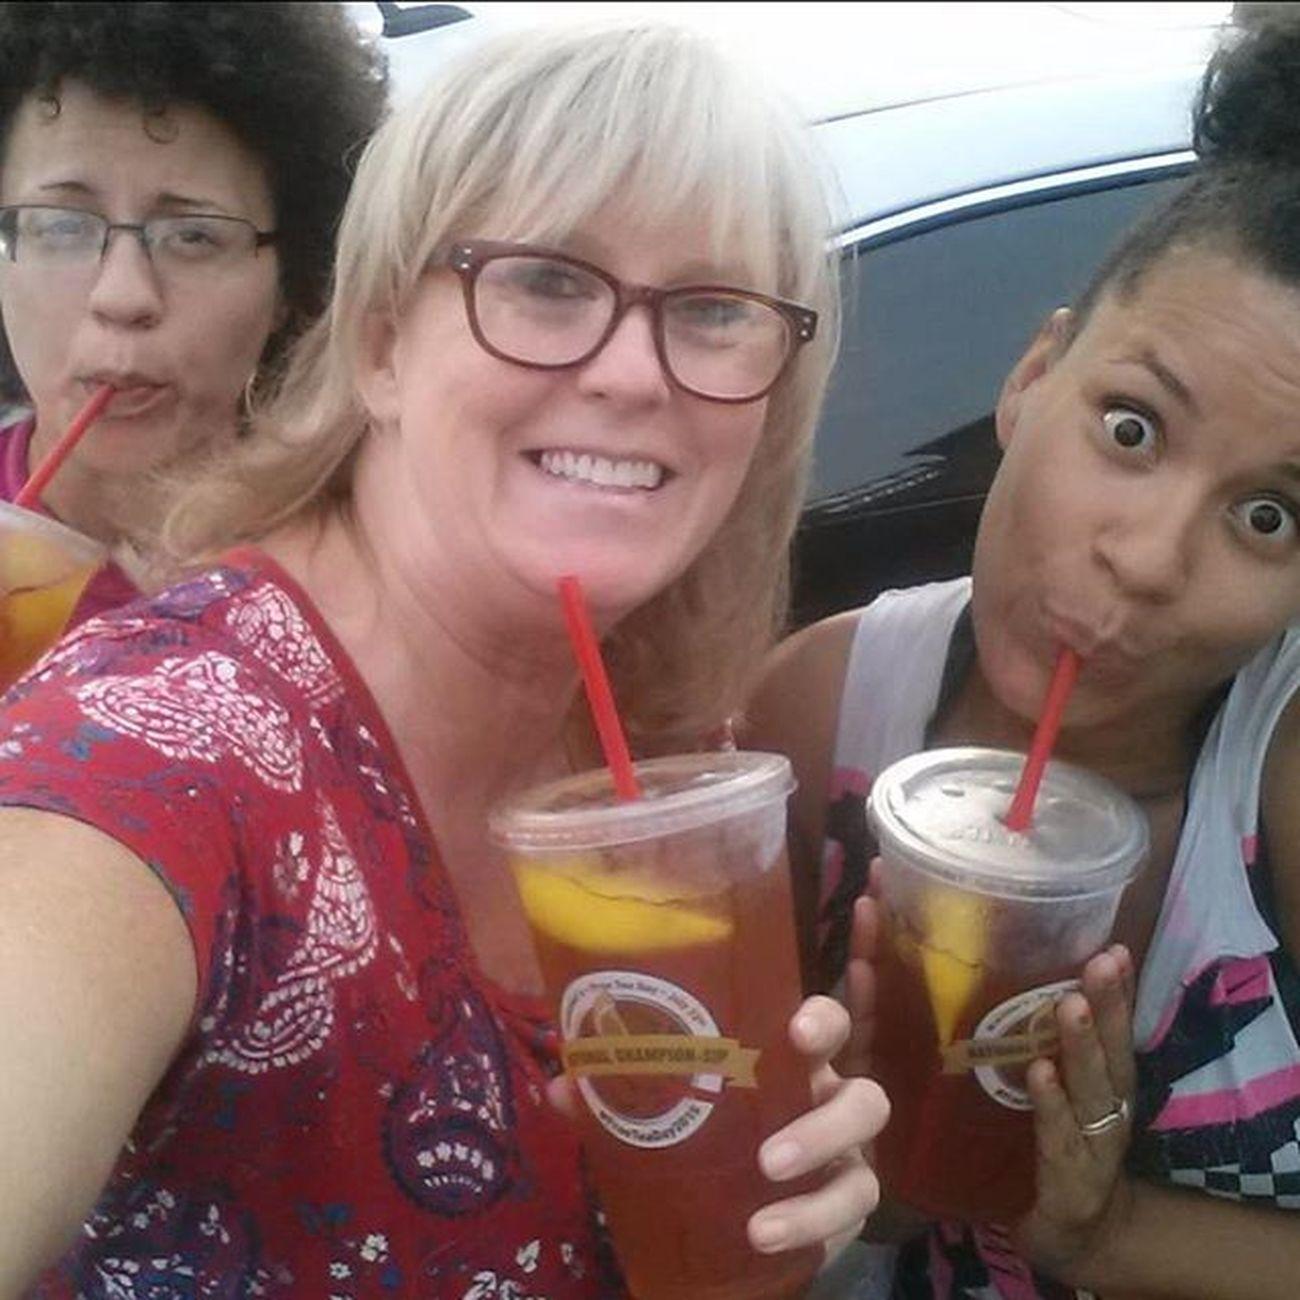 SouthernWomen and their SouthernComfort ... Mcalistersdeli FreeTeaDay2015 WeLookLikeACookie ALemonCookieBcWereYellow 😂 MommyDaughters BiracialBus